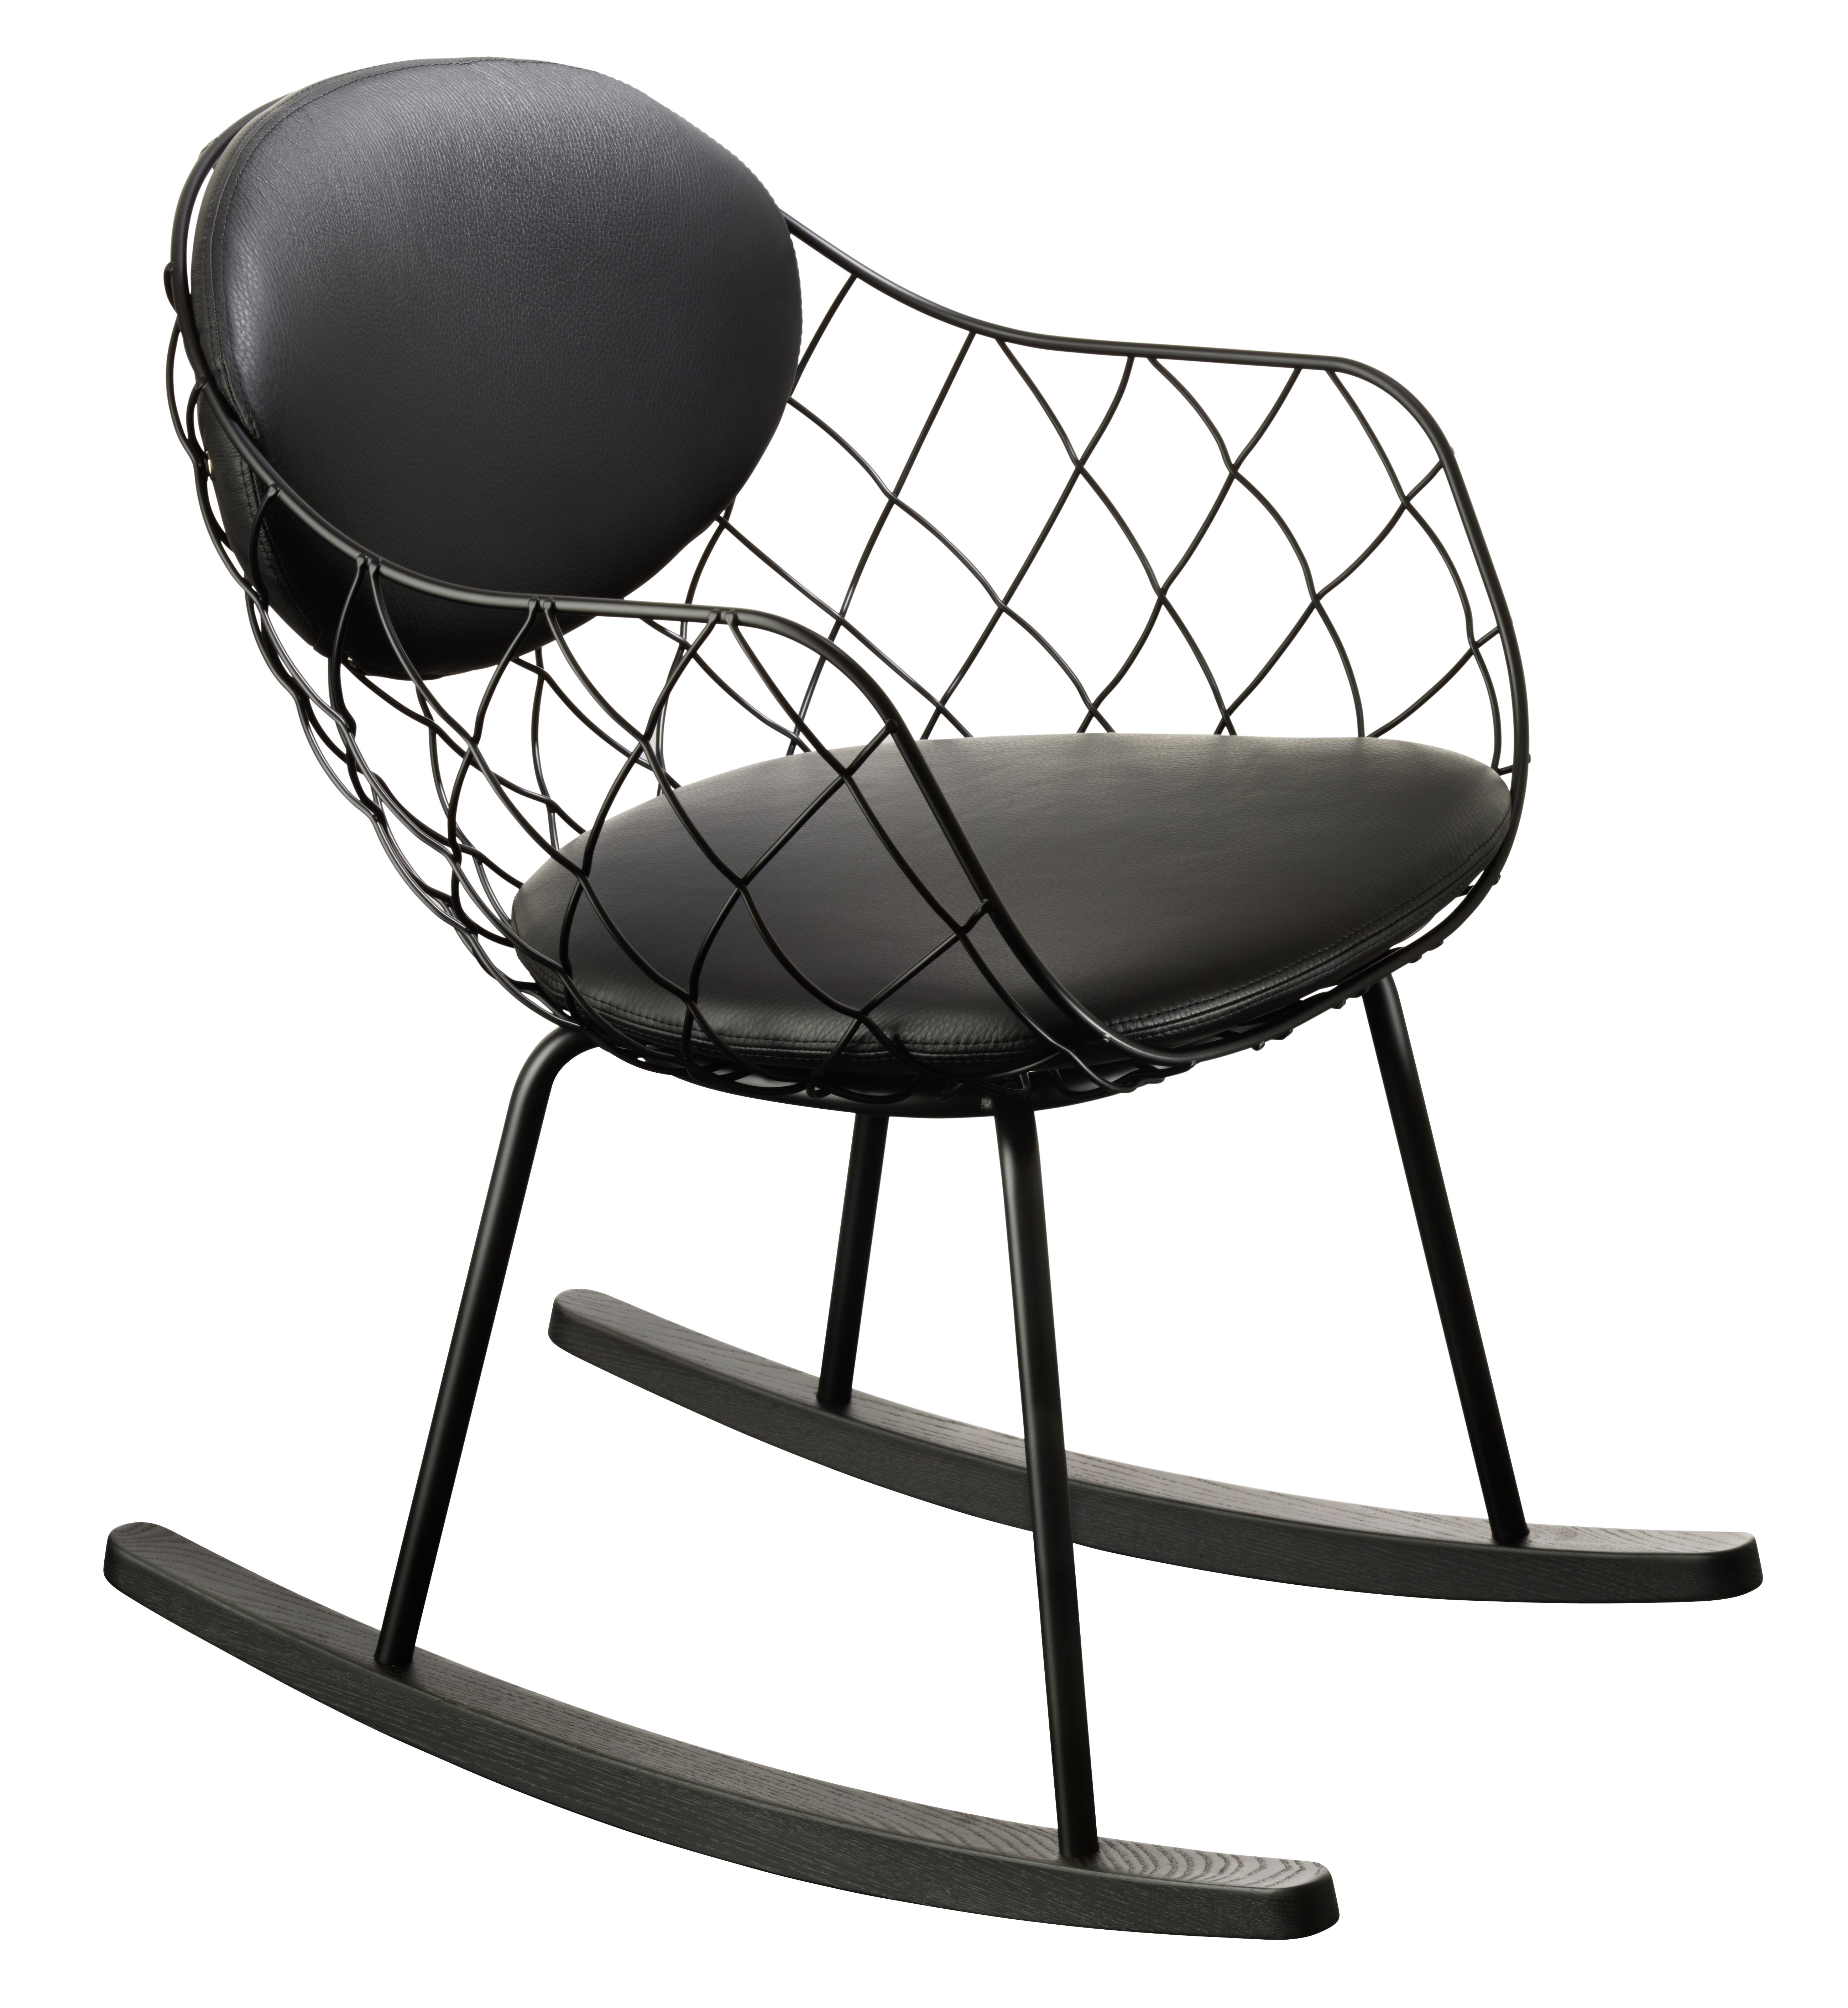 bouroullec white steelwood product magis owo ronan chair erwan e online